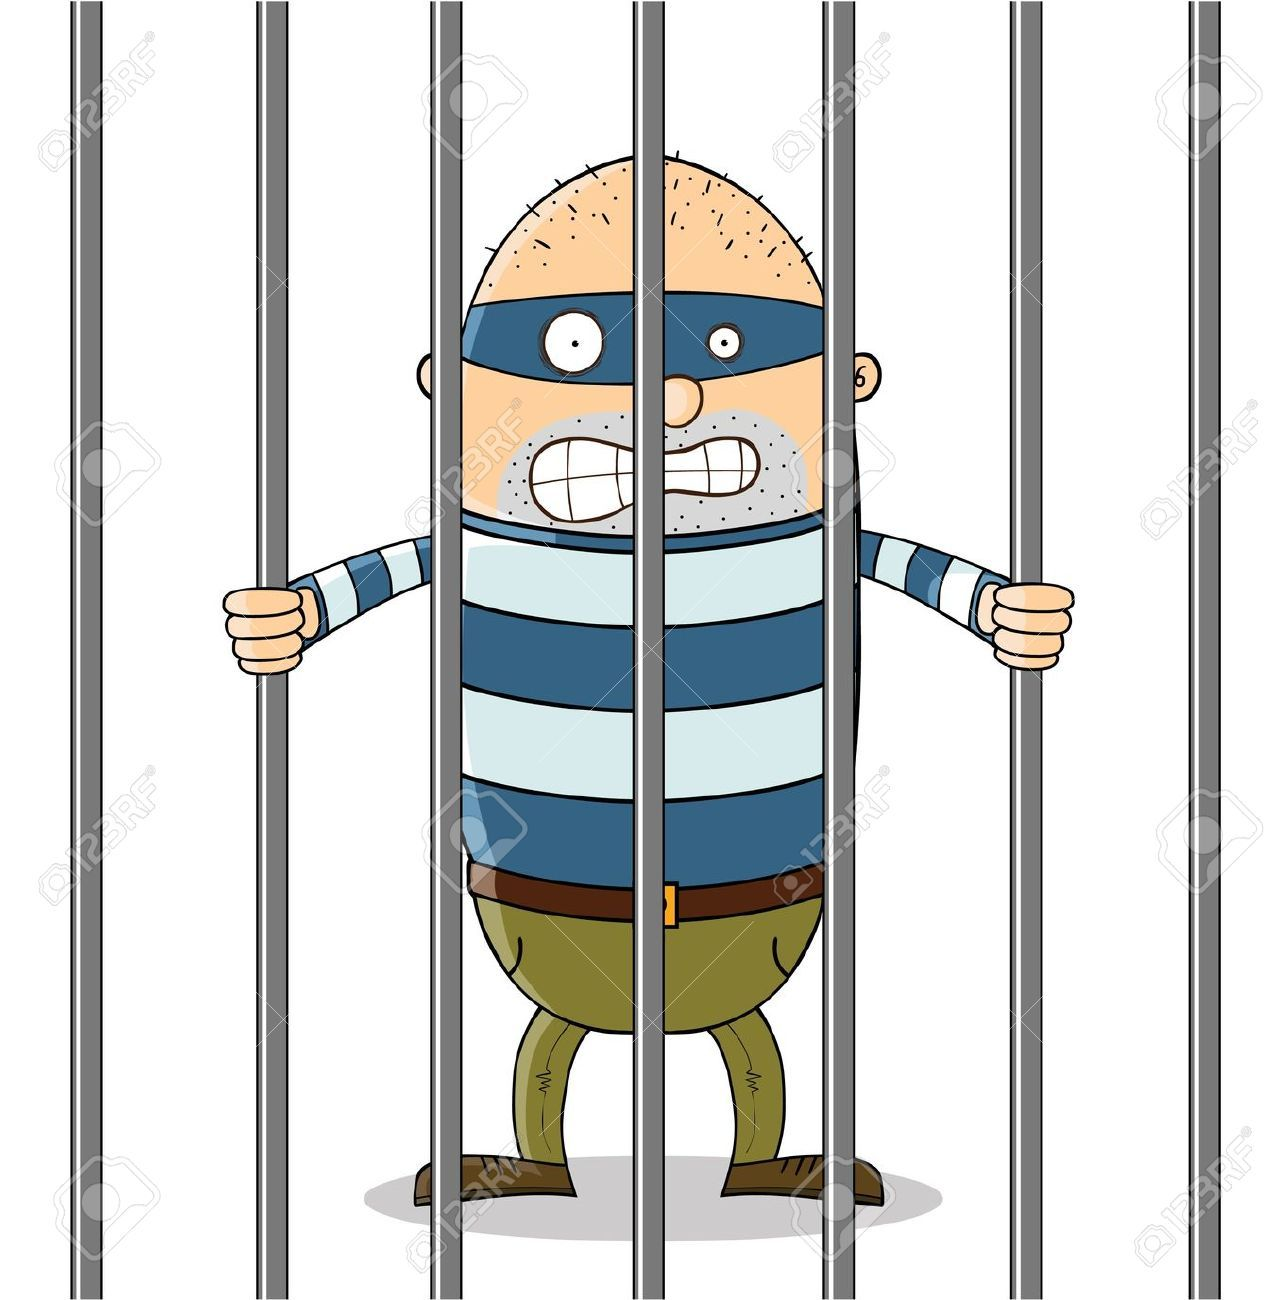 Jail Cartoon Clip Art | Cartoon Man in Jail Clipart (58 ...